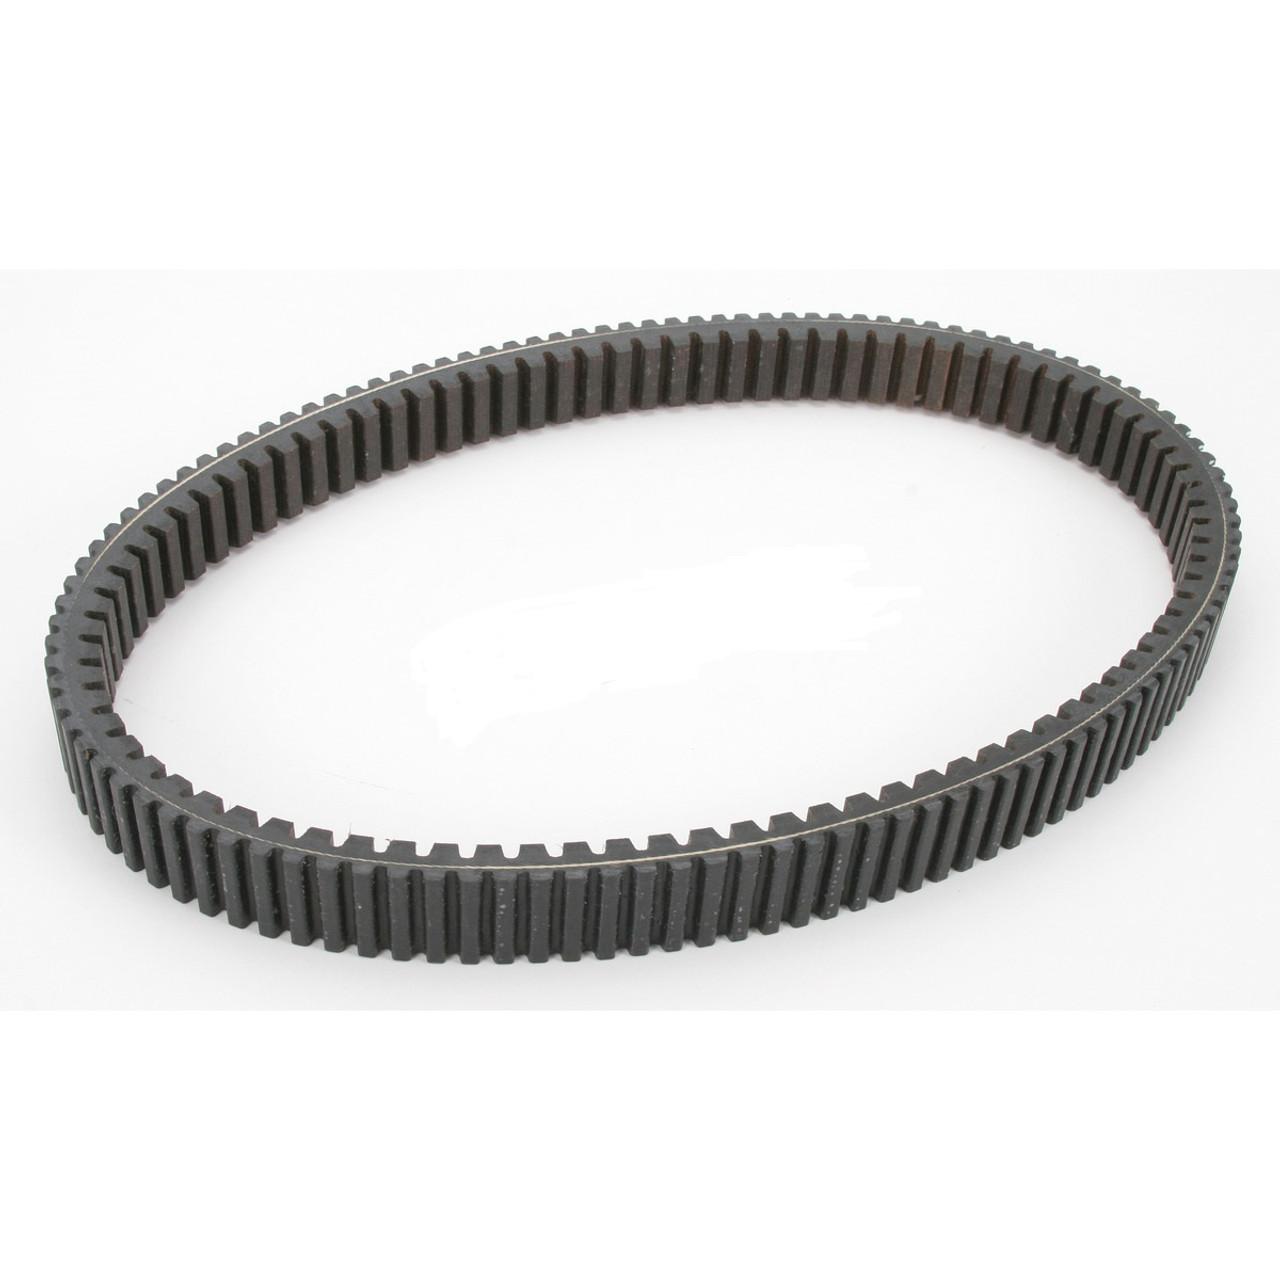 hight resolution of cfmoto performance atv utv 500cc 400 600 625 drive belt replaces cf188 055000 whygostock com